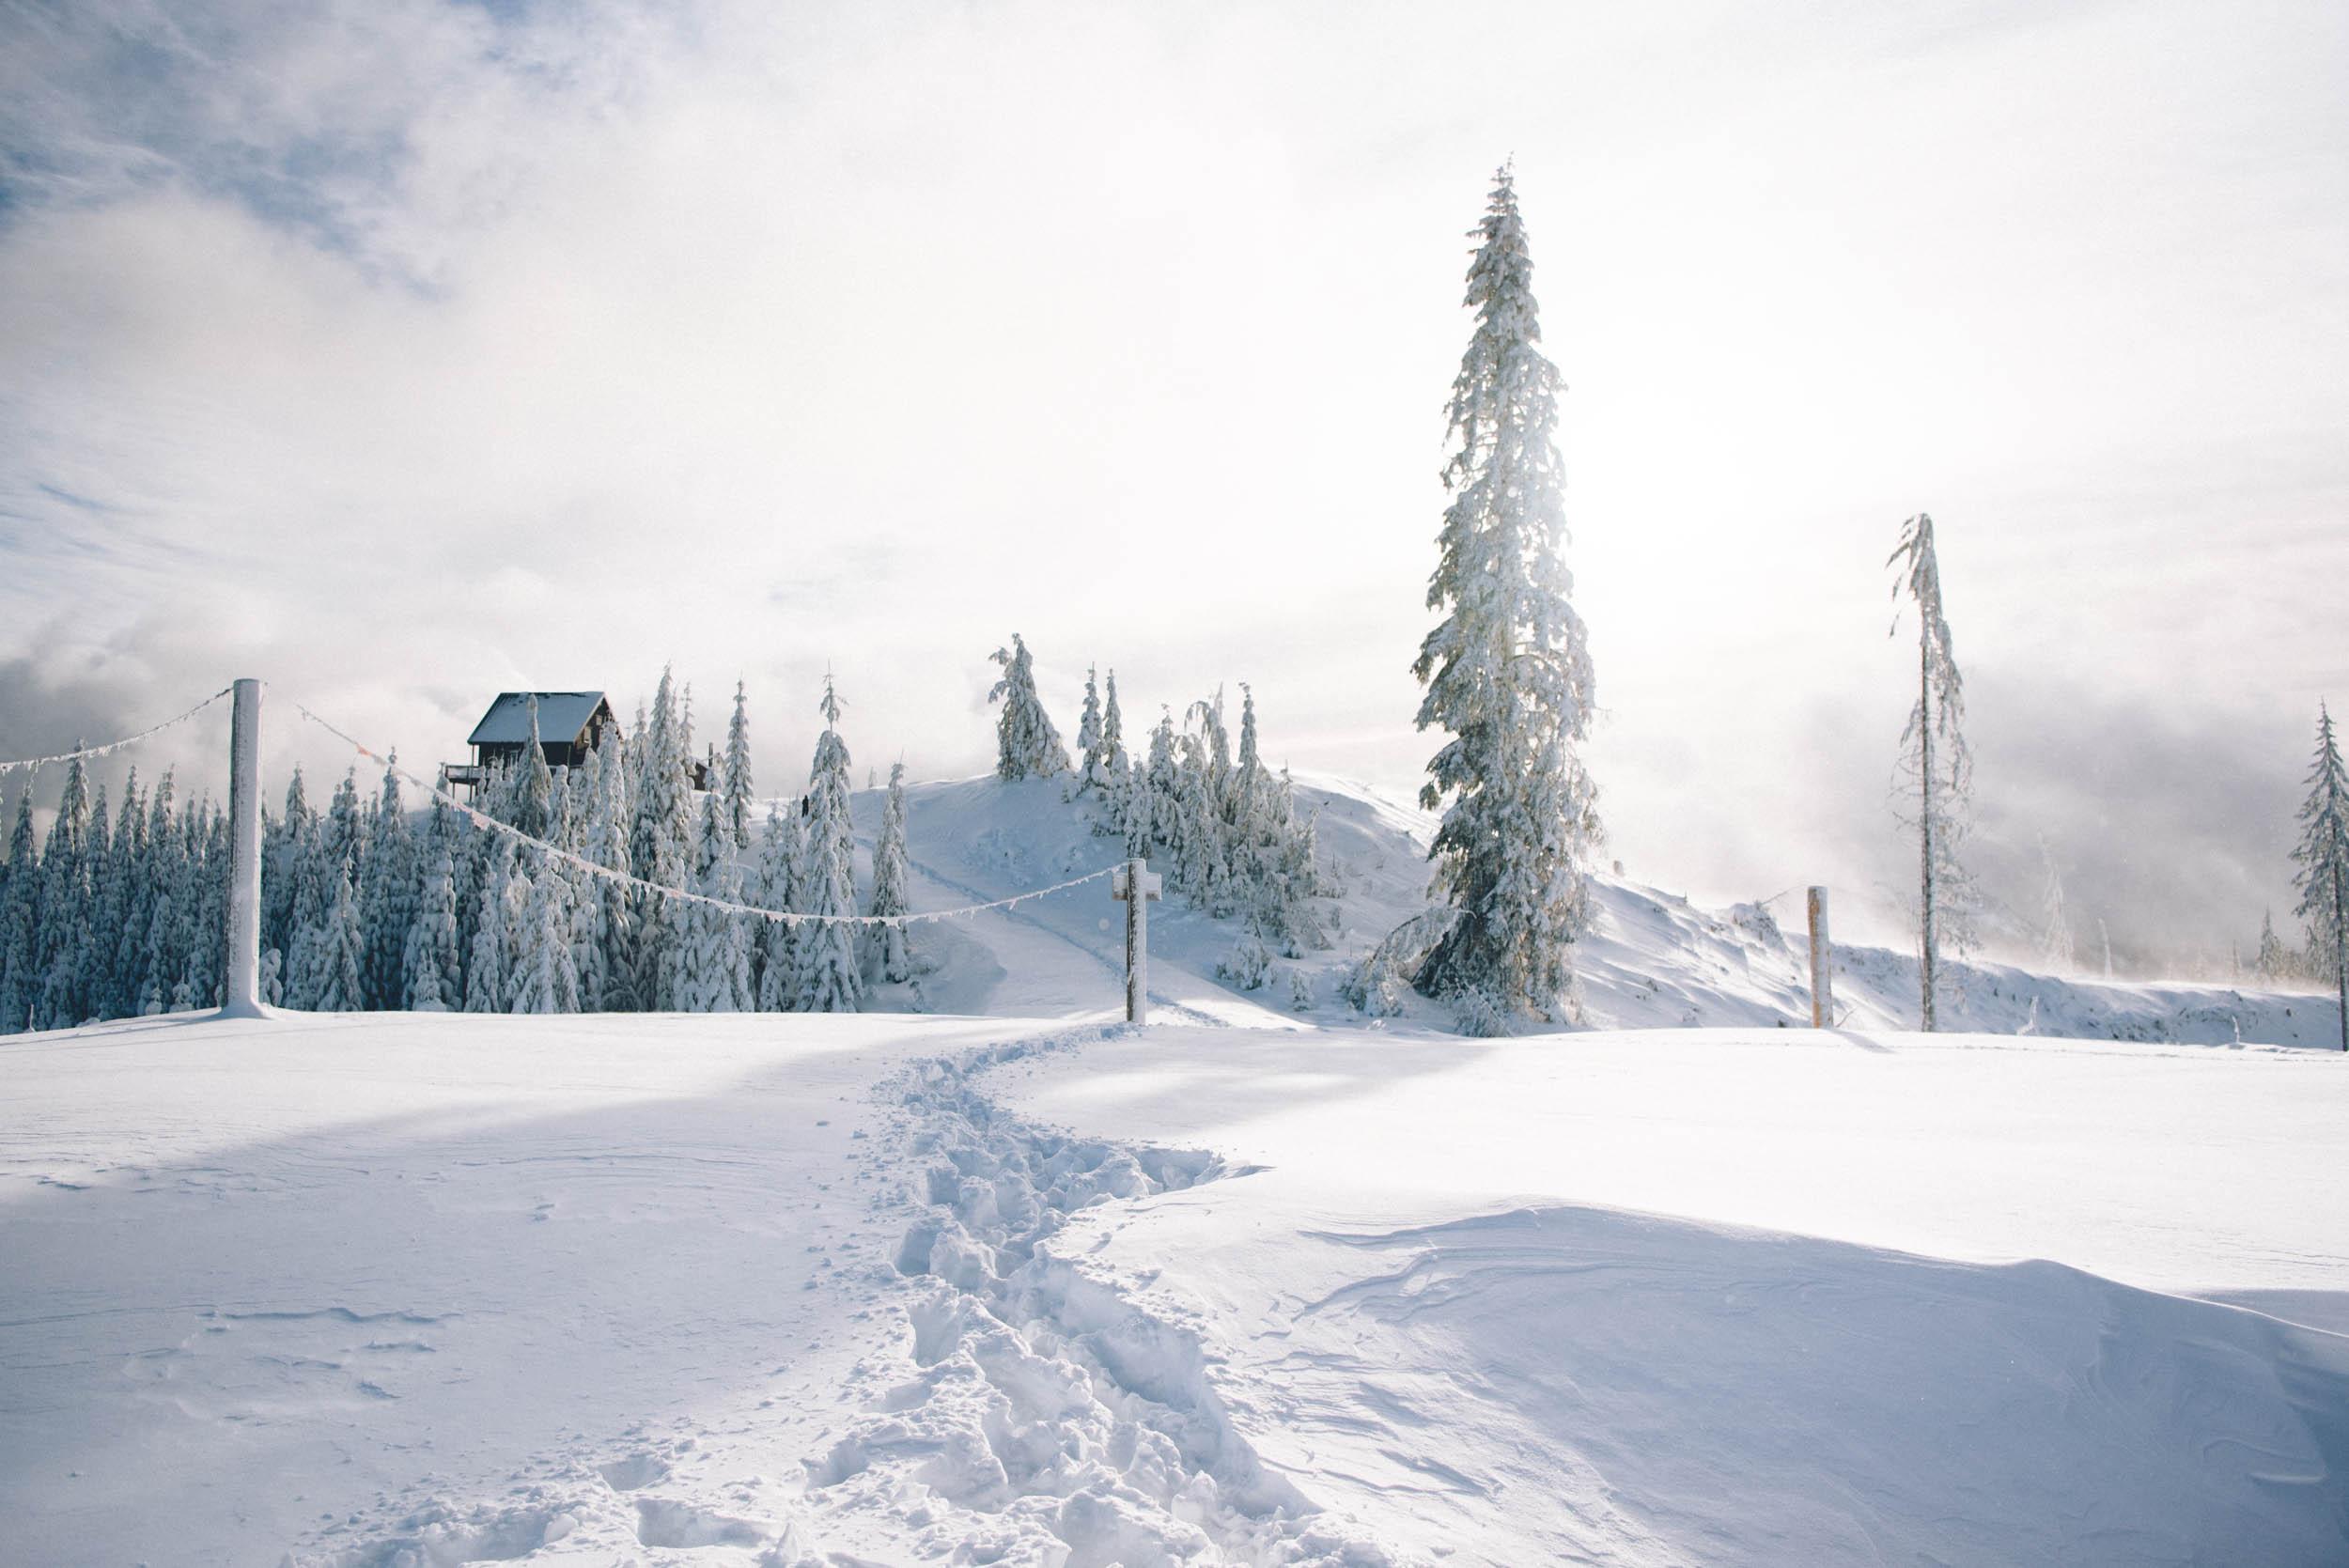 Miriam-Subbiah-Snow-Bowl-Hut-19.jpg